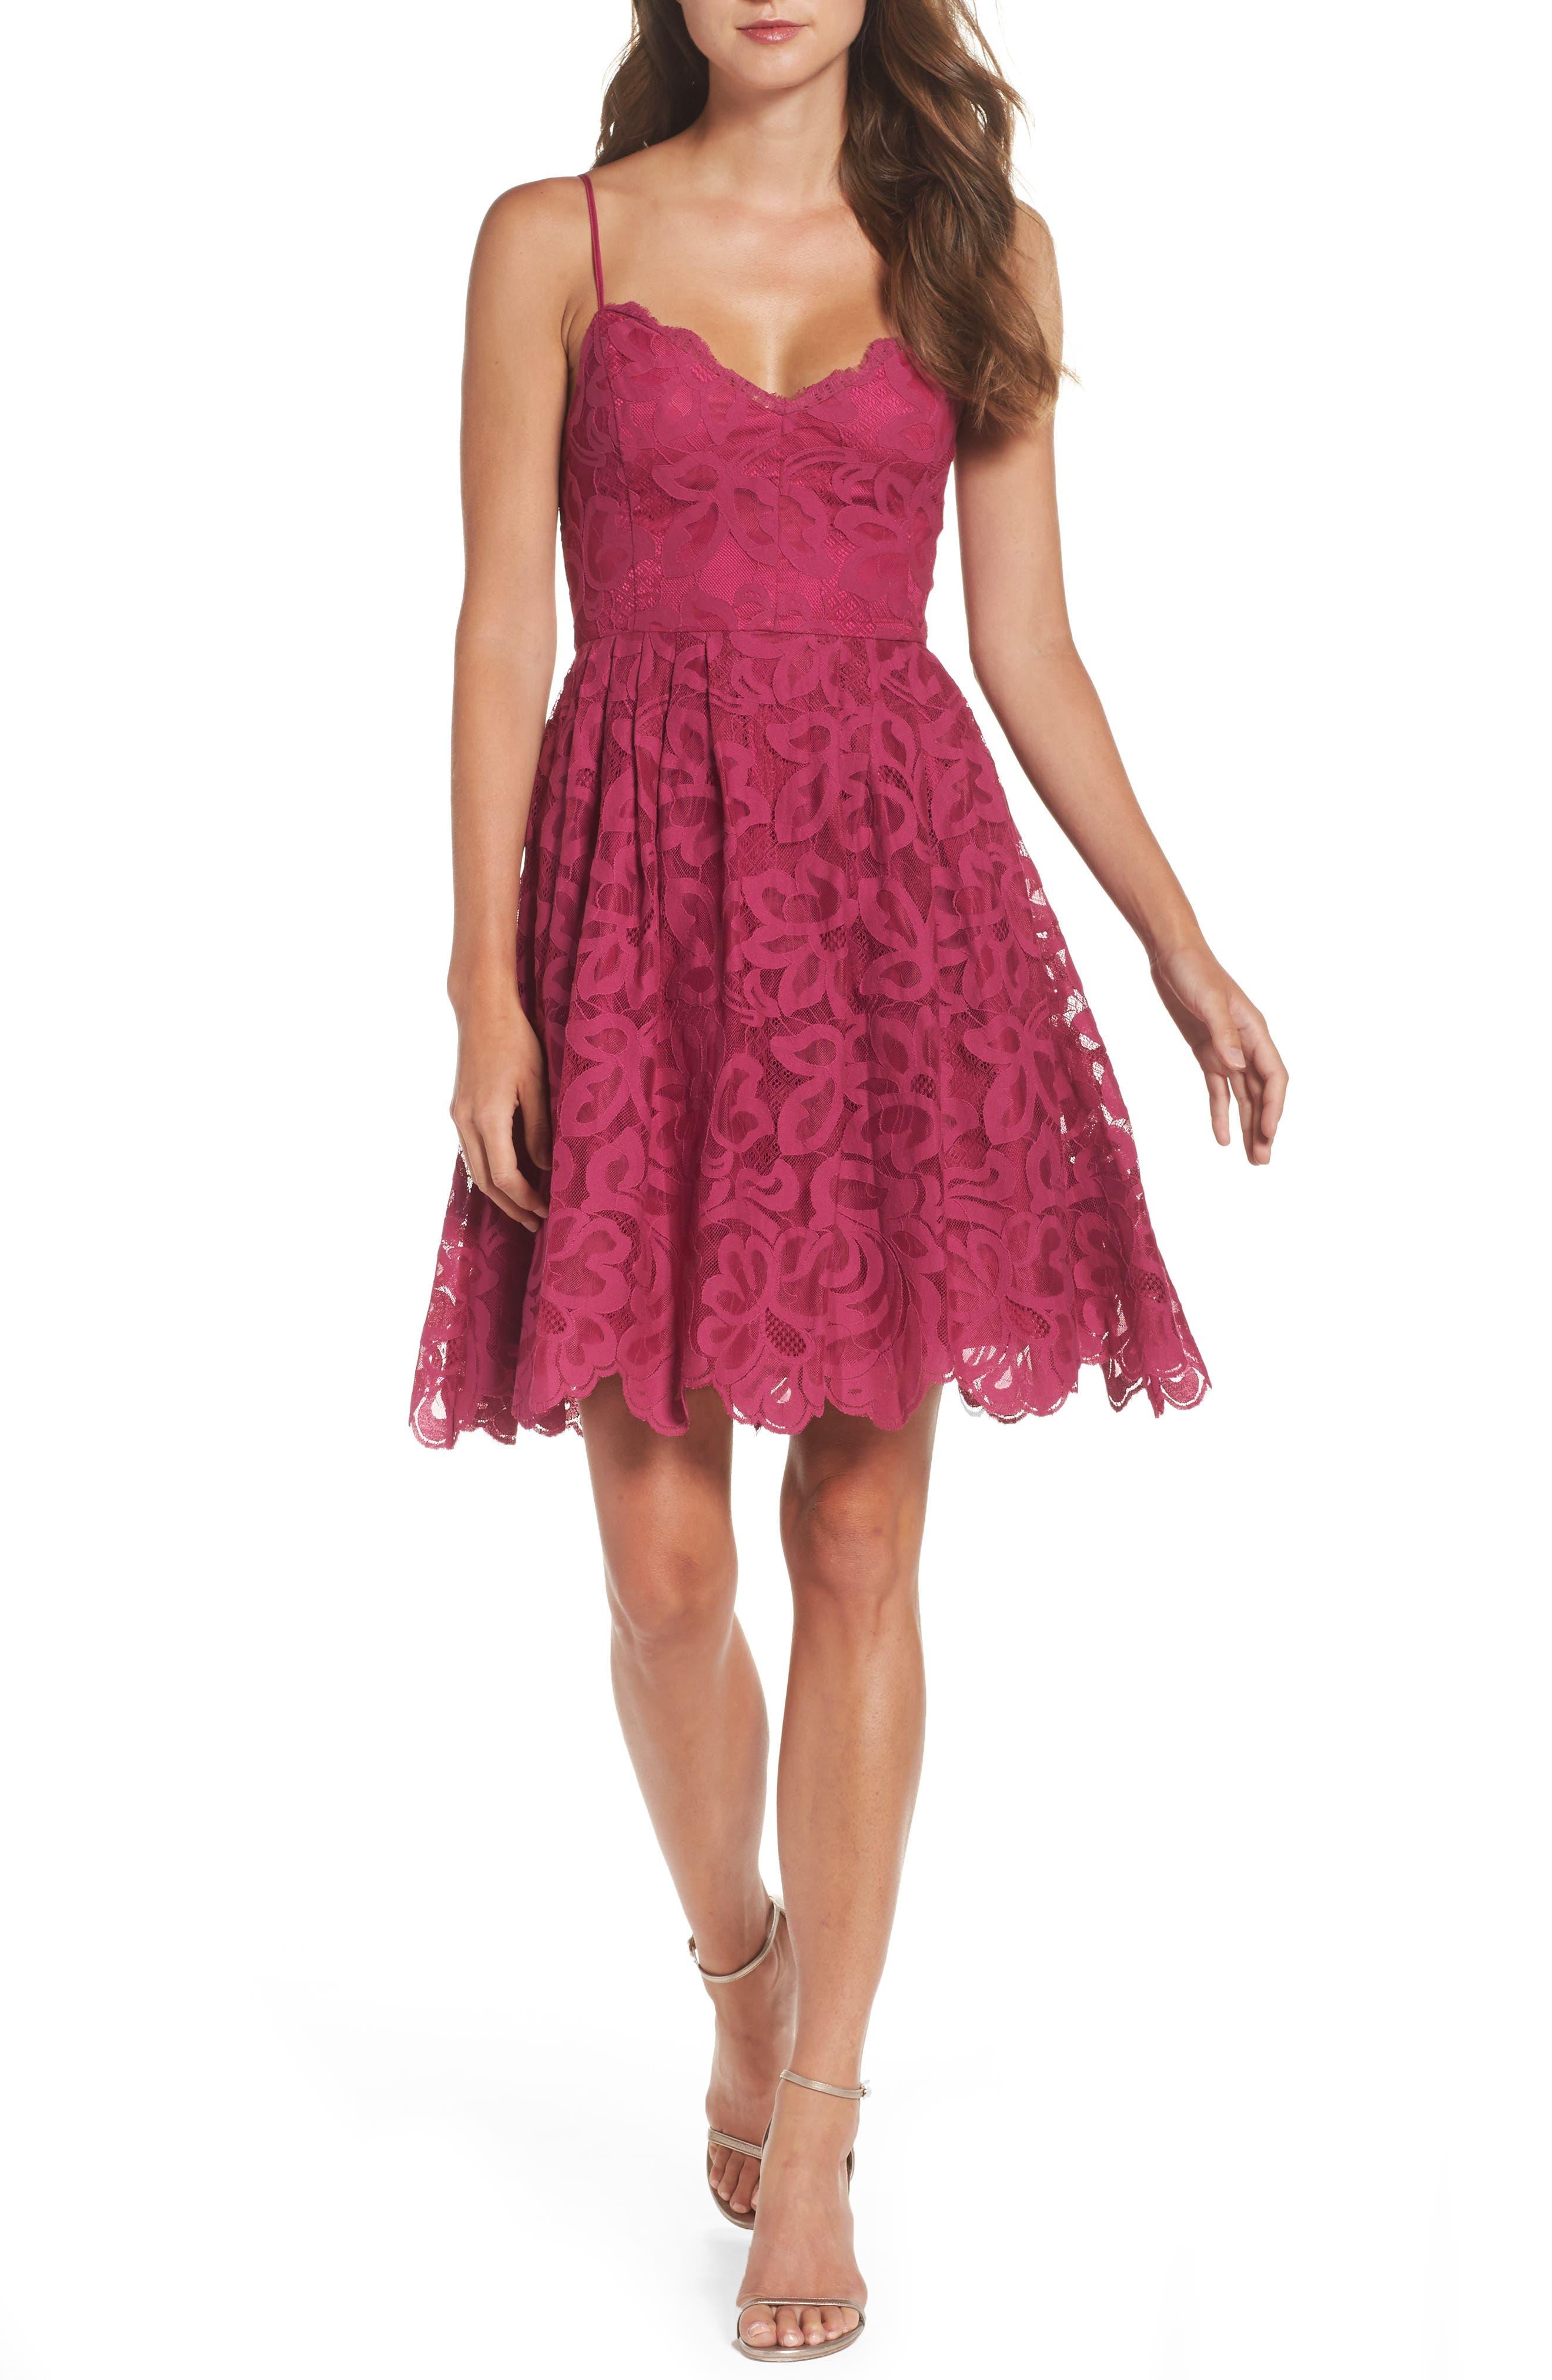 BB Dakota Occasion Celeste Scalloped Lace Fit & Flare Dress